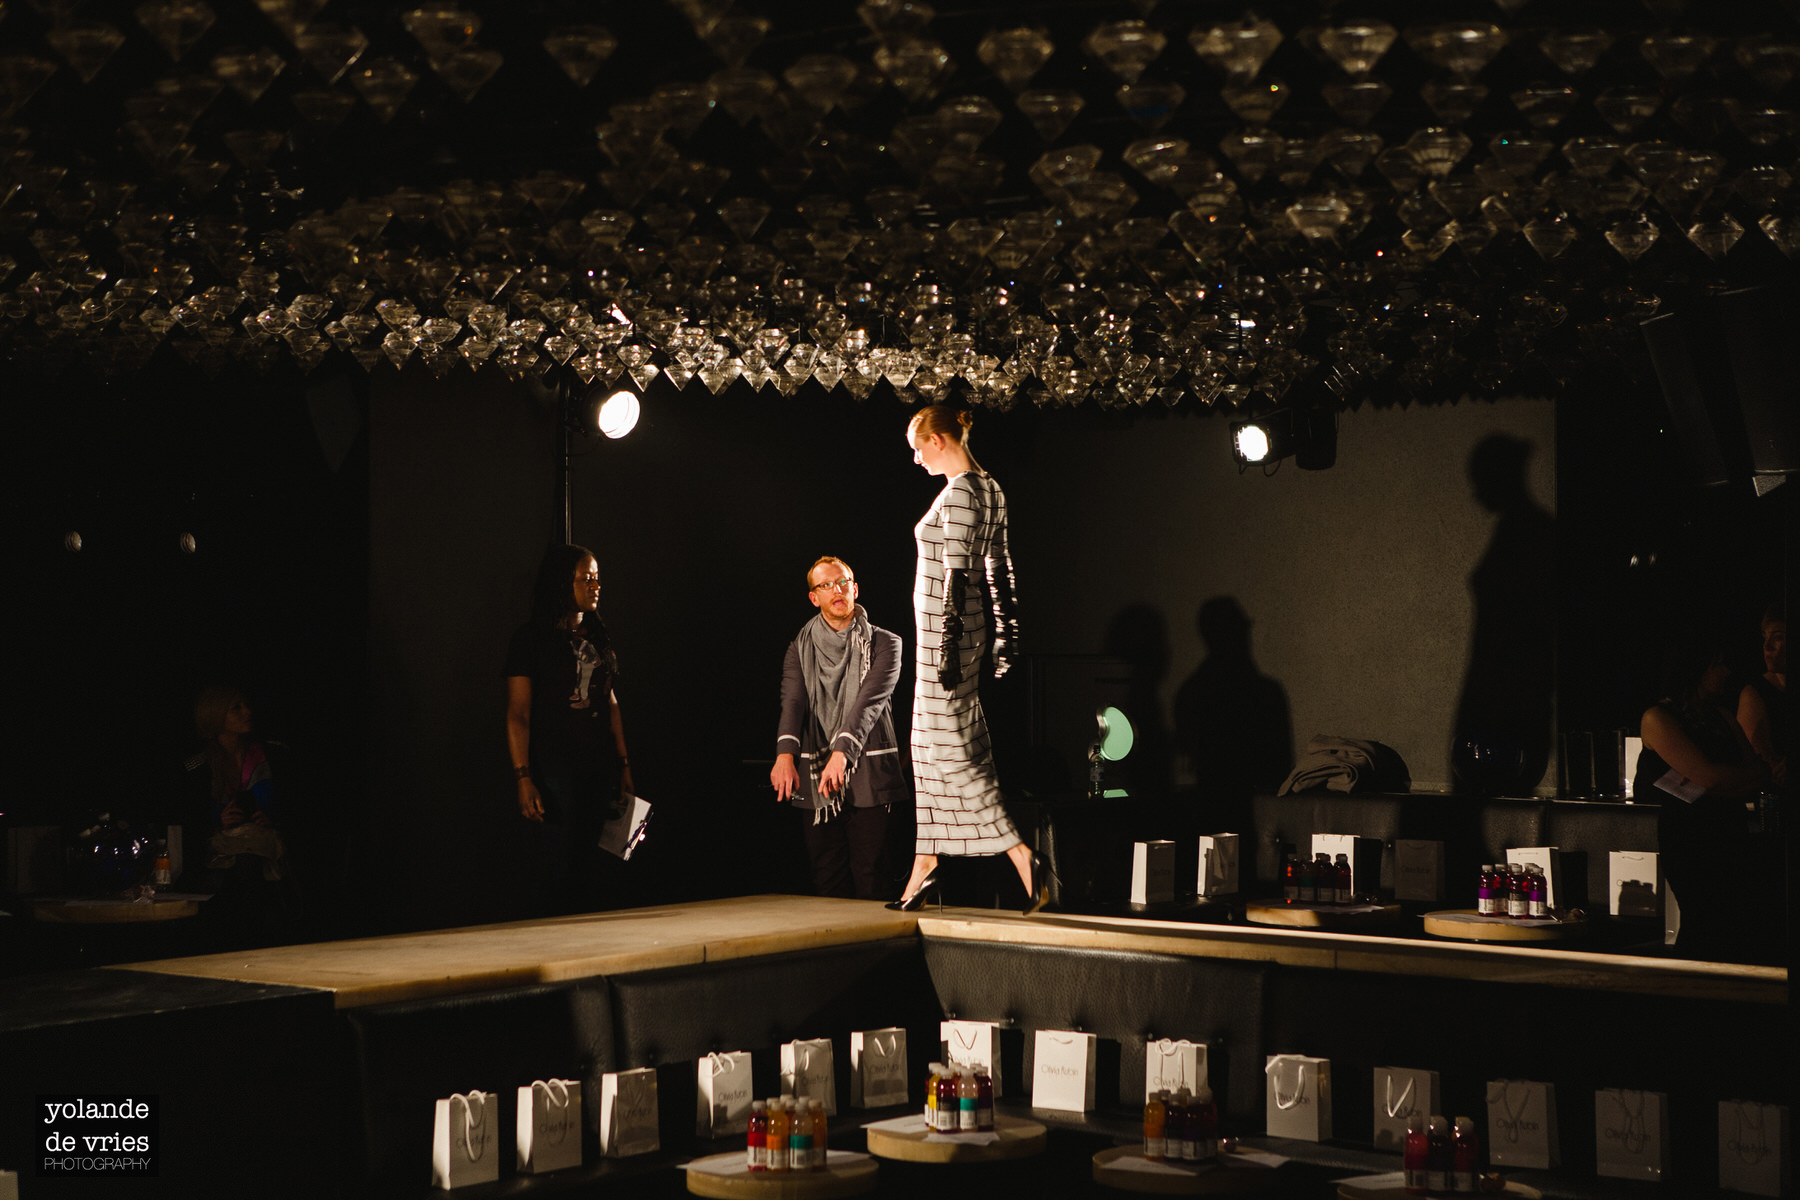 Olivia-Rubin-SS11-London-Fashion-Week-1443.jpg